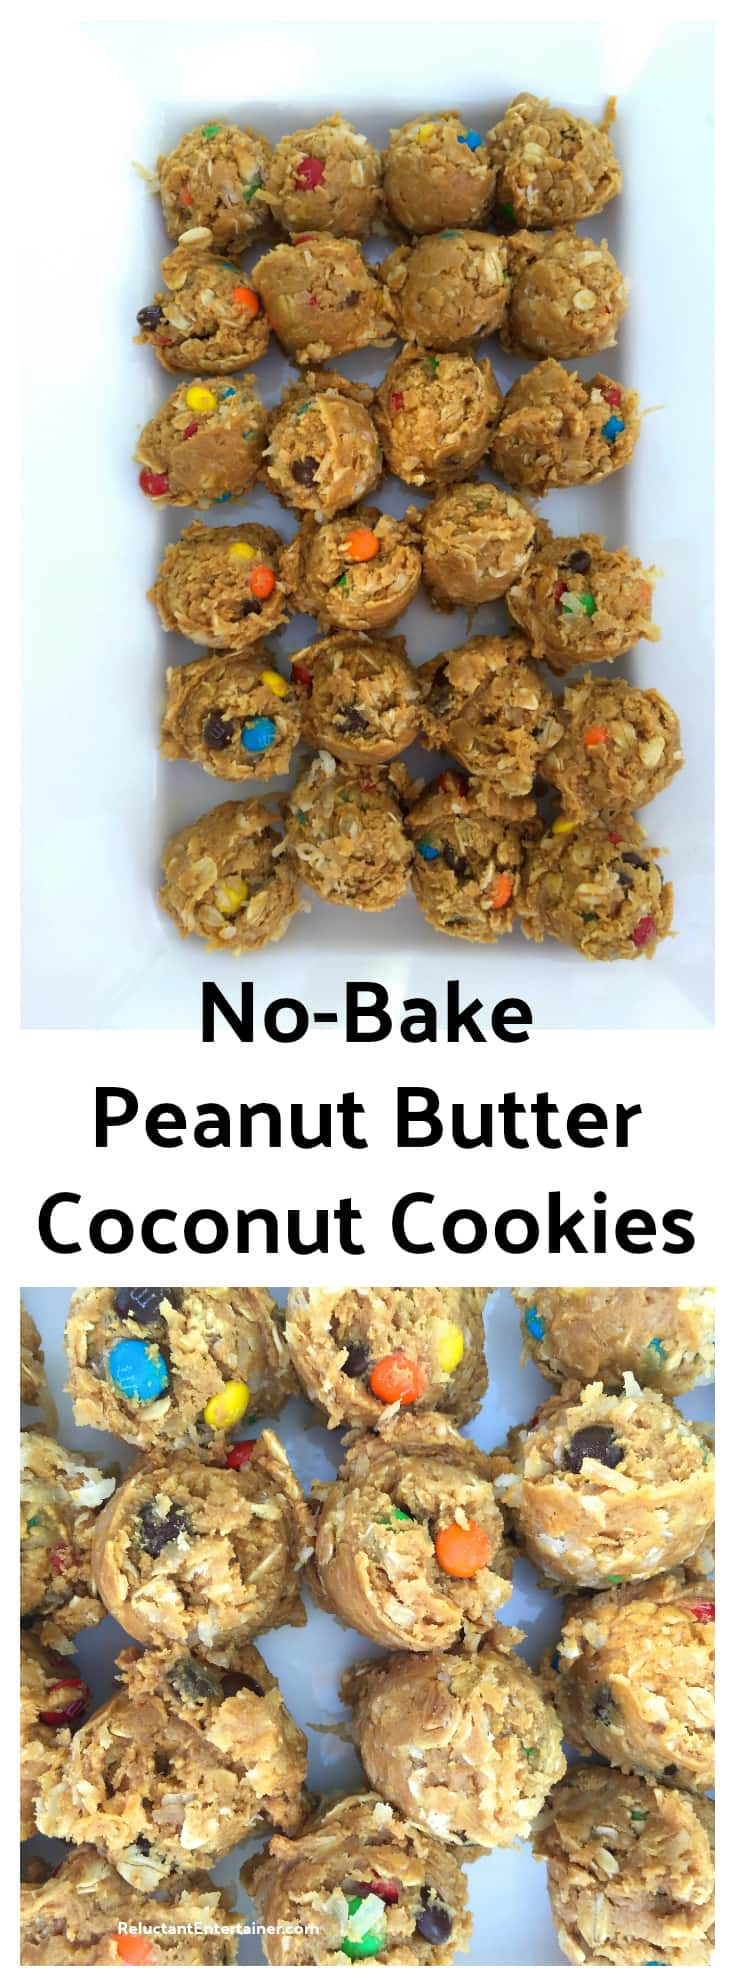 No-Bake Peanut Butter Coconut Cookies